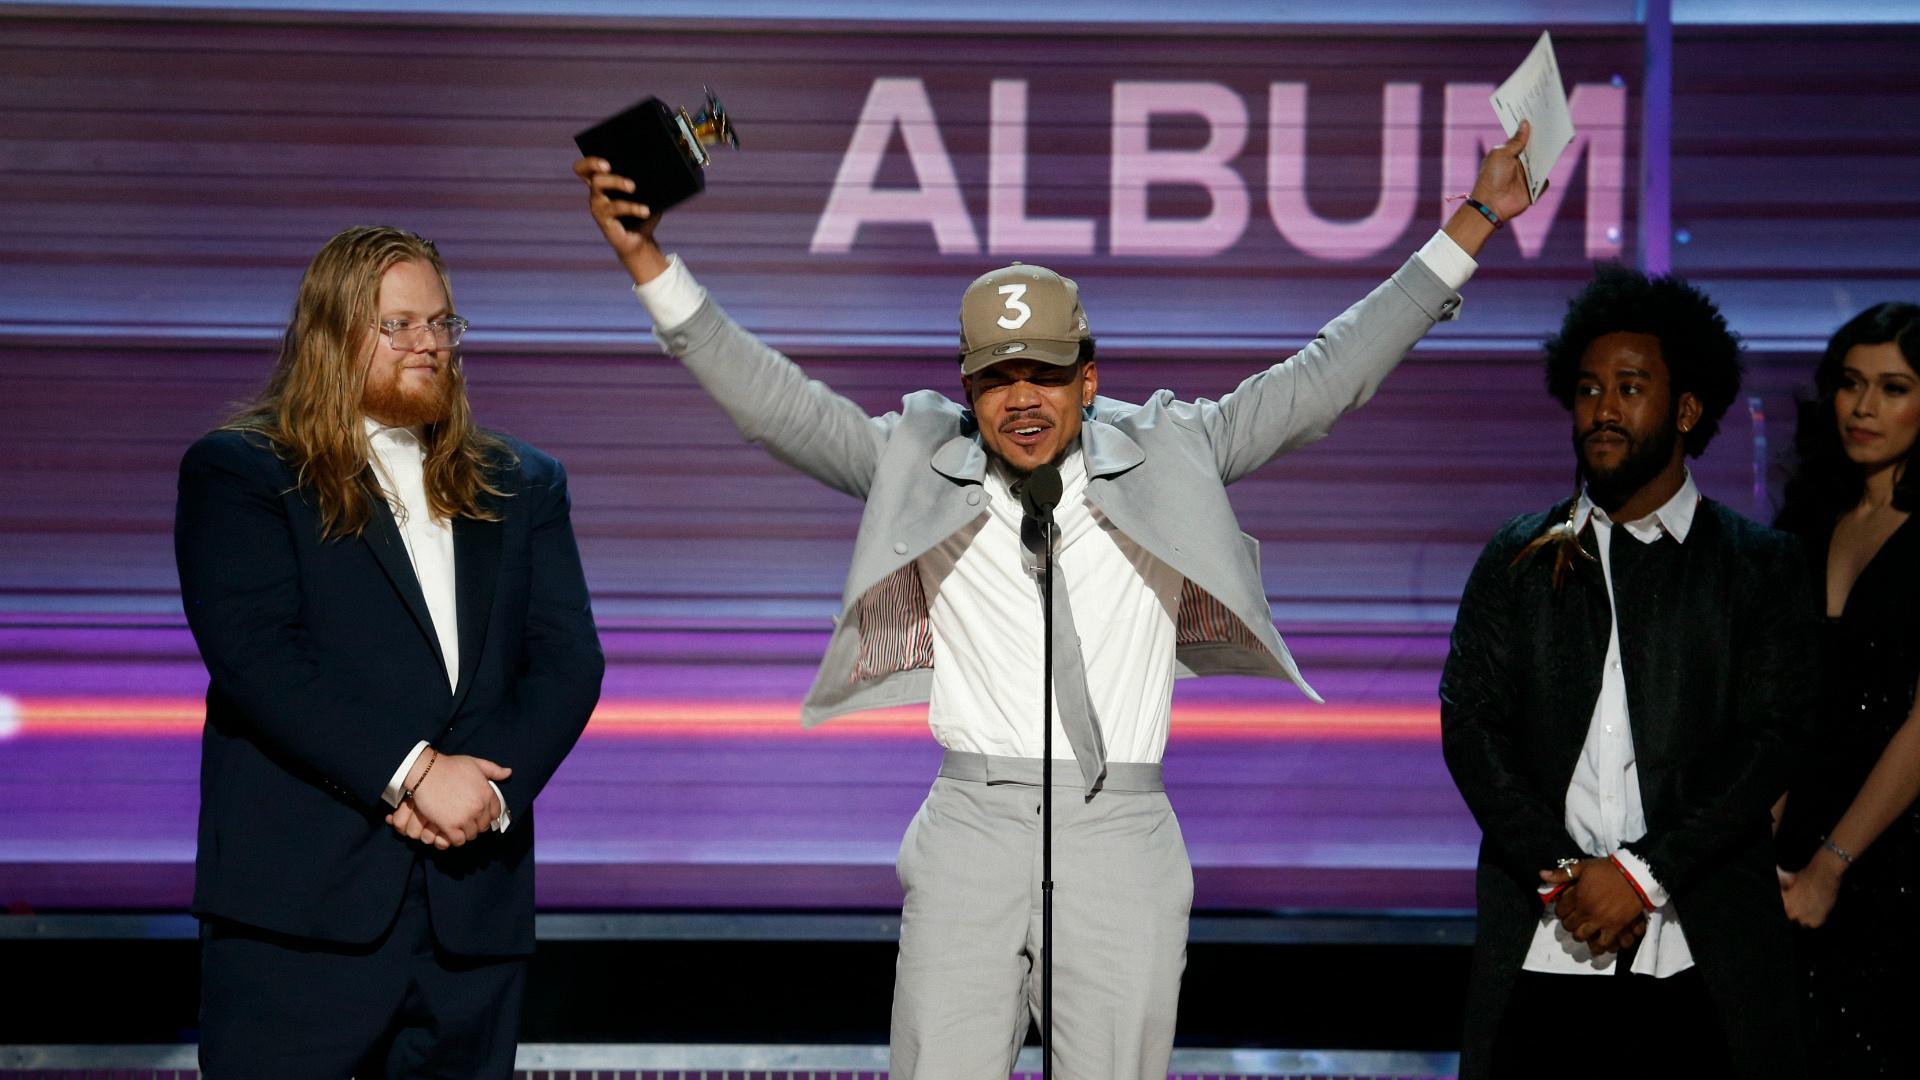 Chance The Rapper wins Best Rap Album at the 2017 GRAMMY Awards